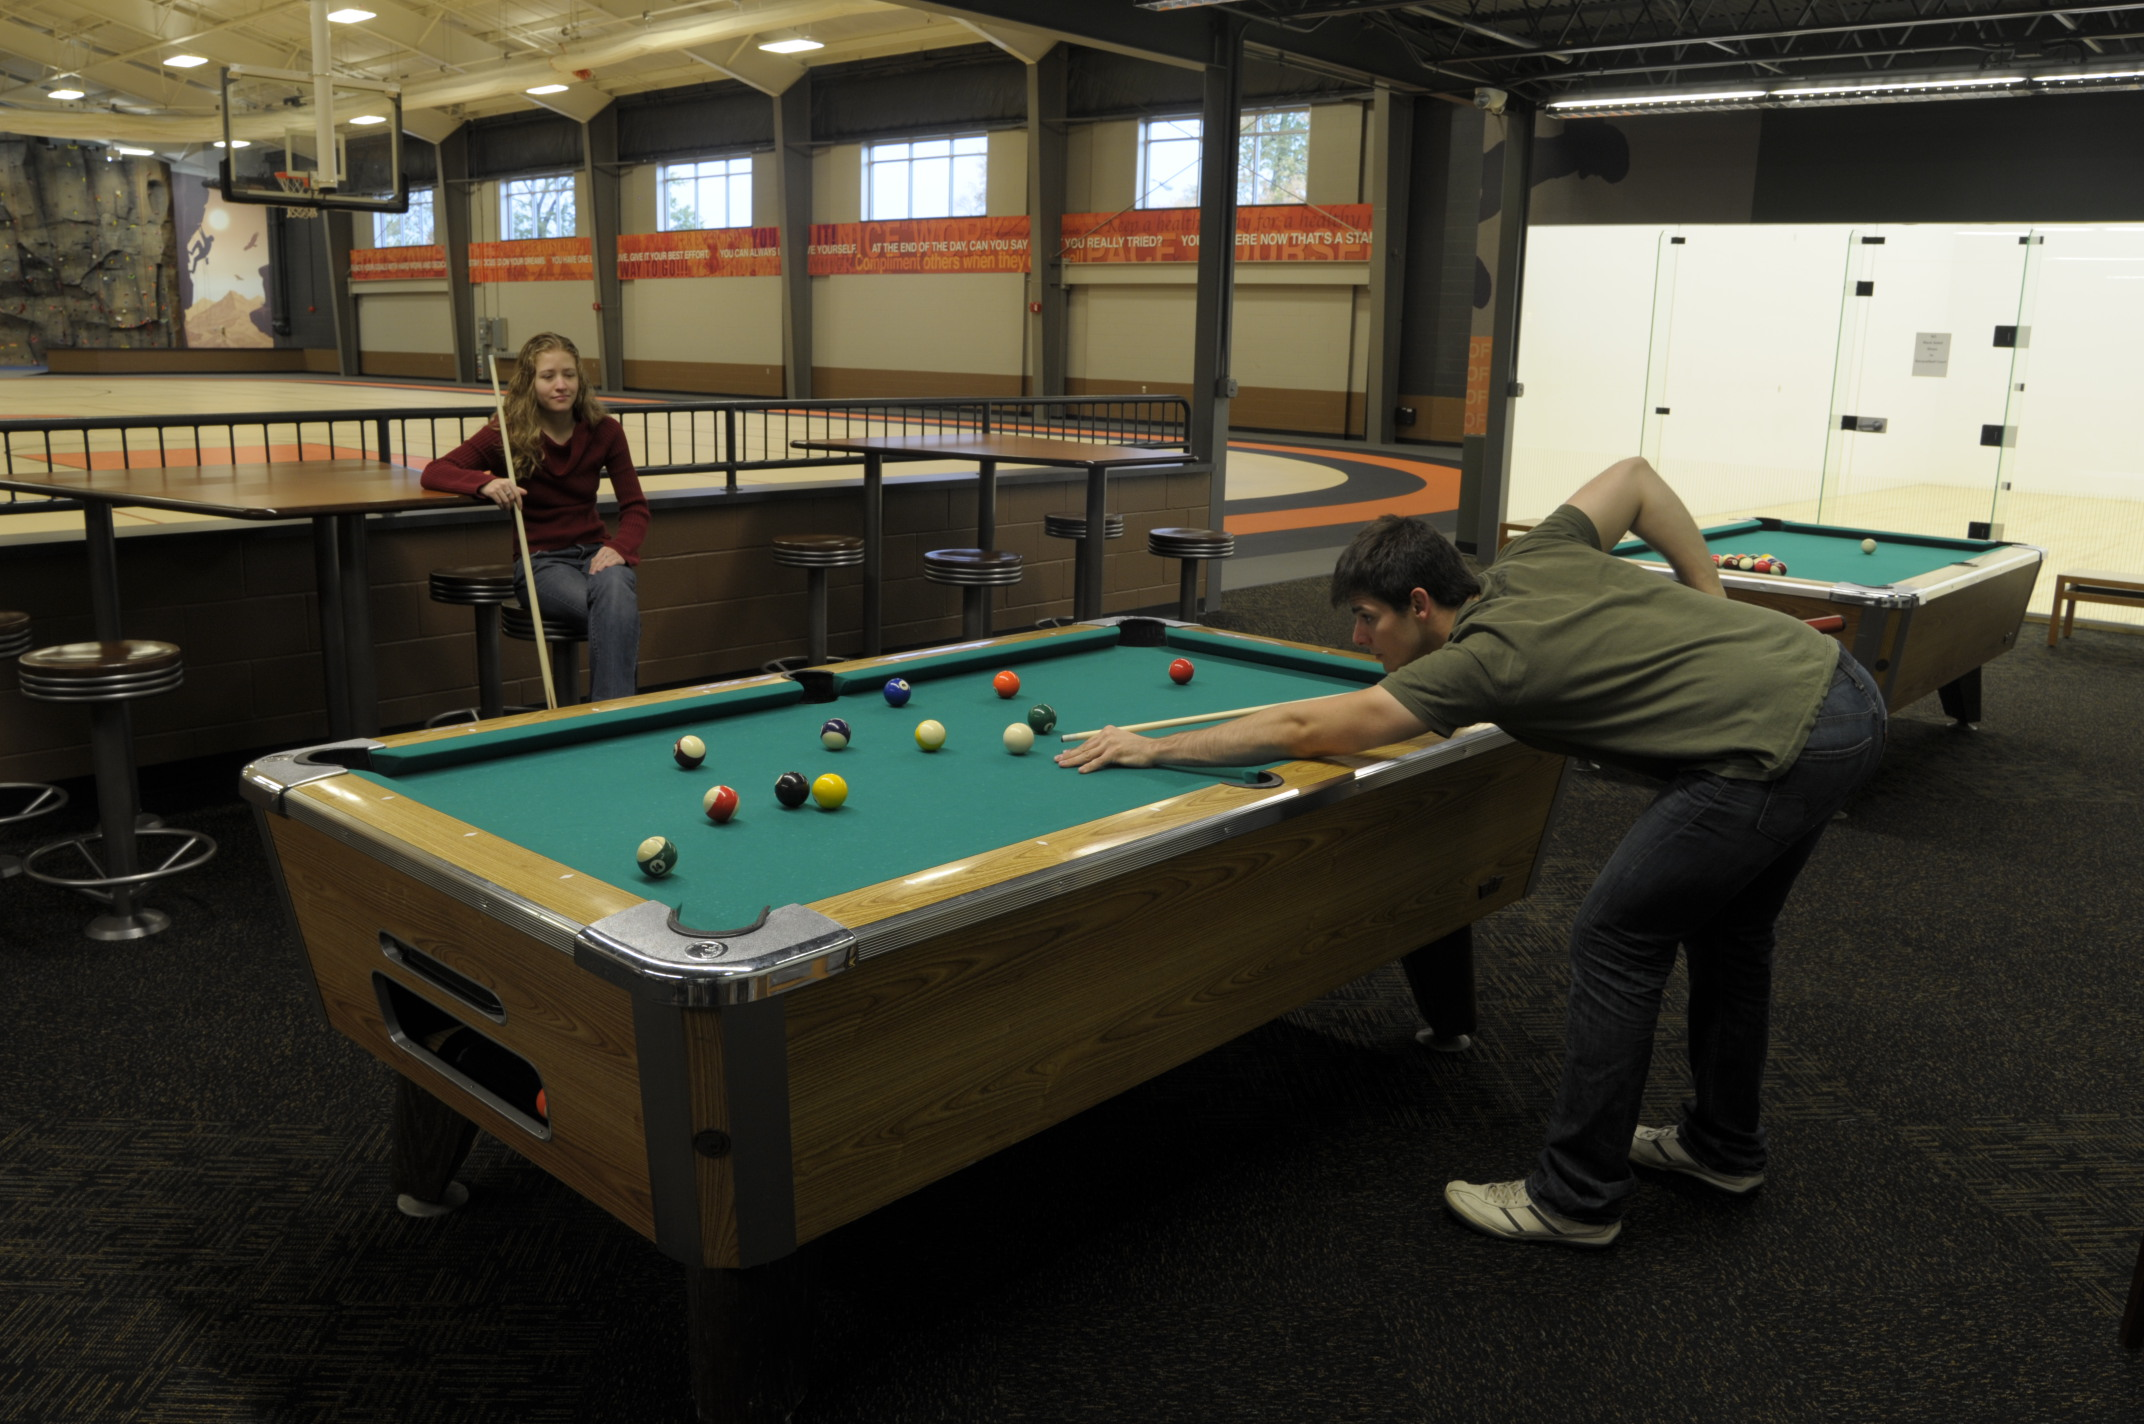 www.rcmarchitects.com - university of findlay - recreation center (4)